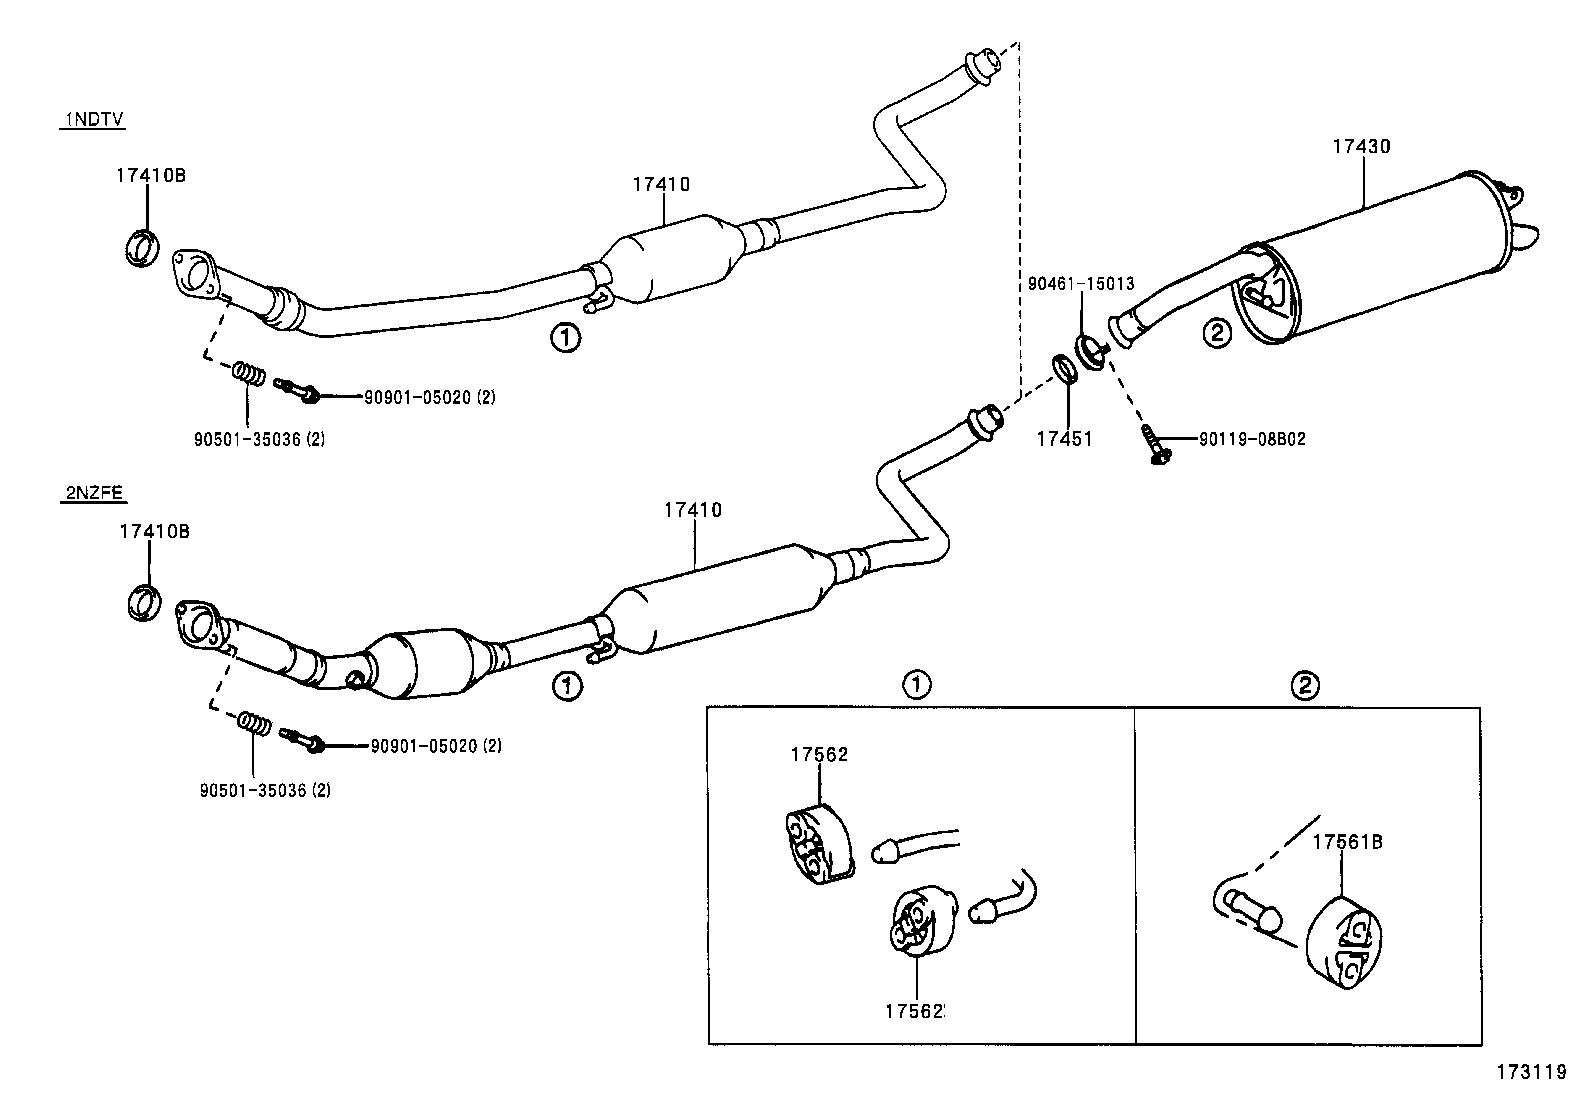 66 impala tail light wiring diagram